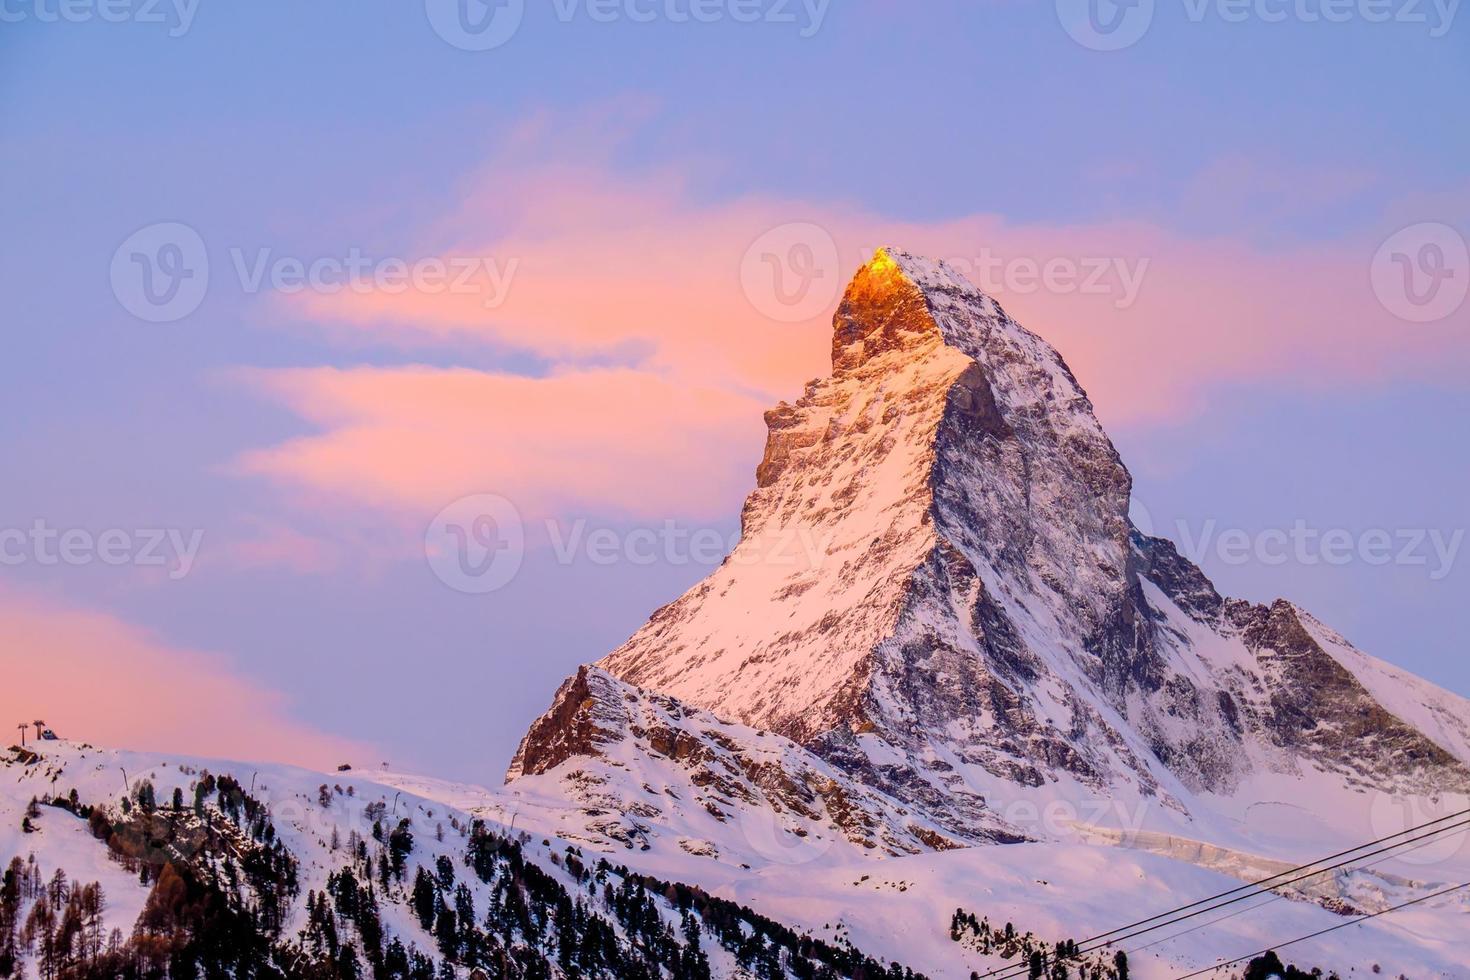 Amazing Matterhorn with Zermatt city, Switzerland photo